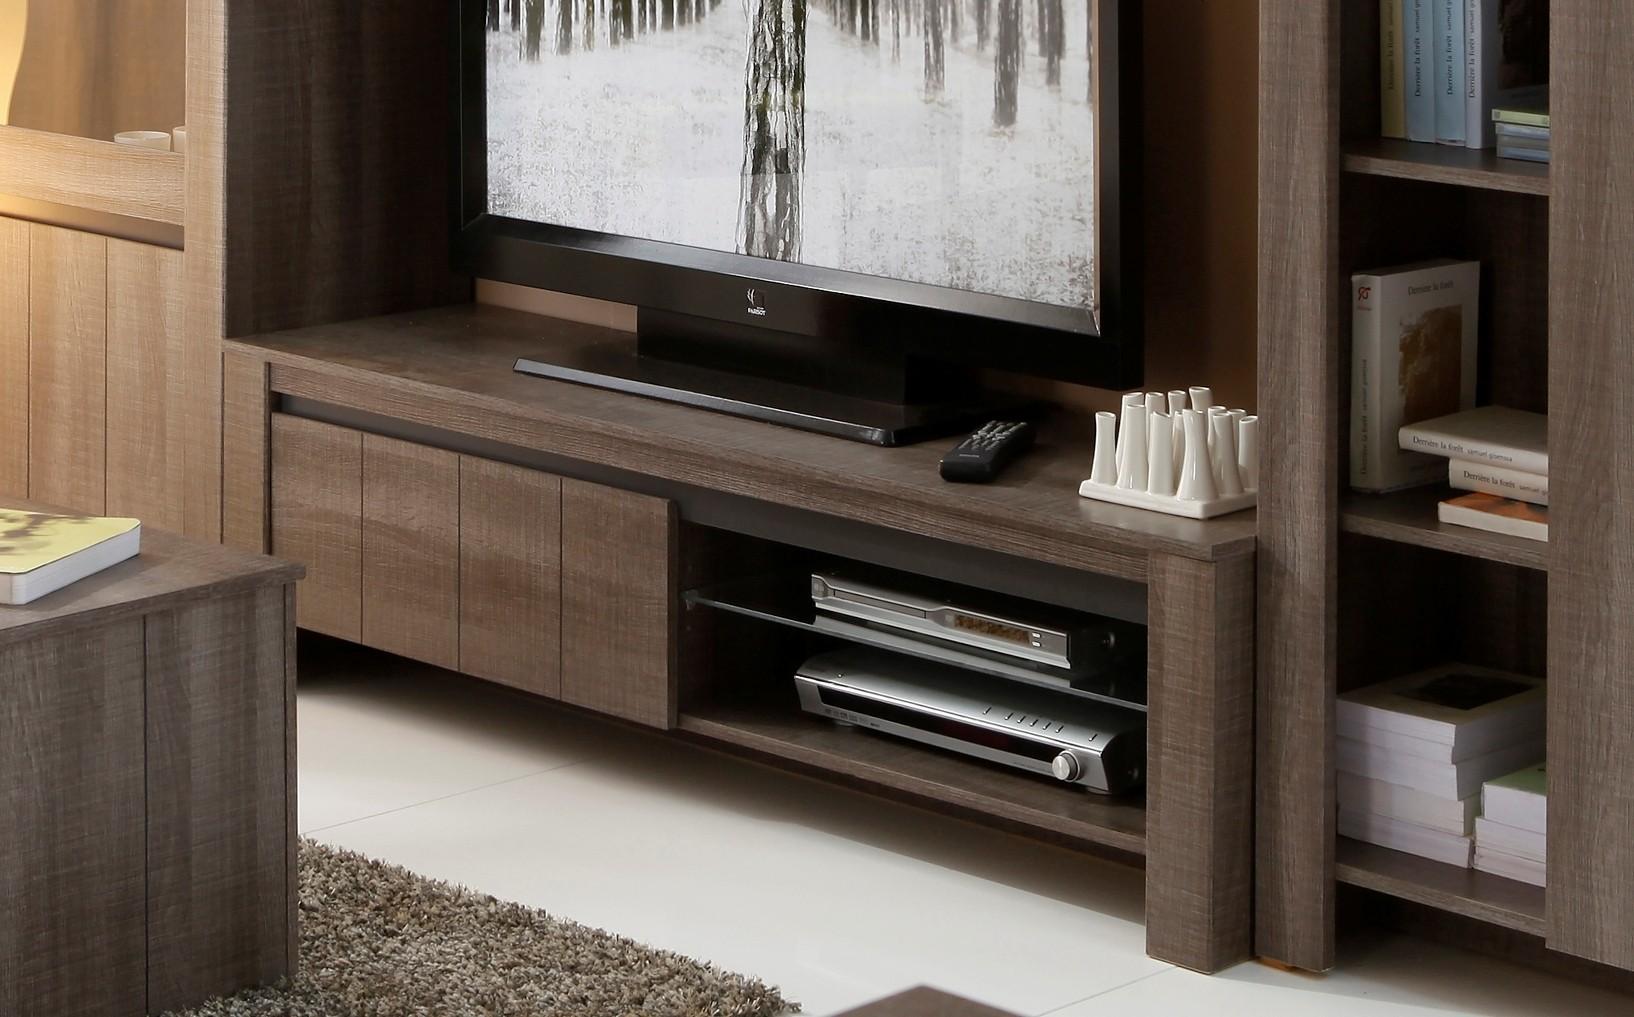 Meuble Tv Intense Teinte R Glisse Prix Discount # Meuble Sous Tv